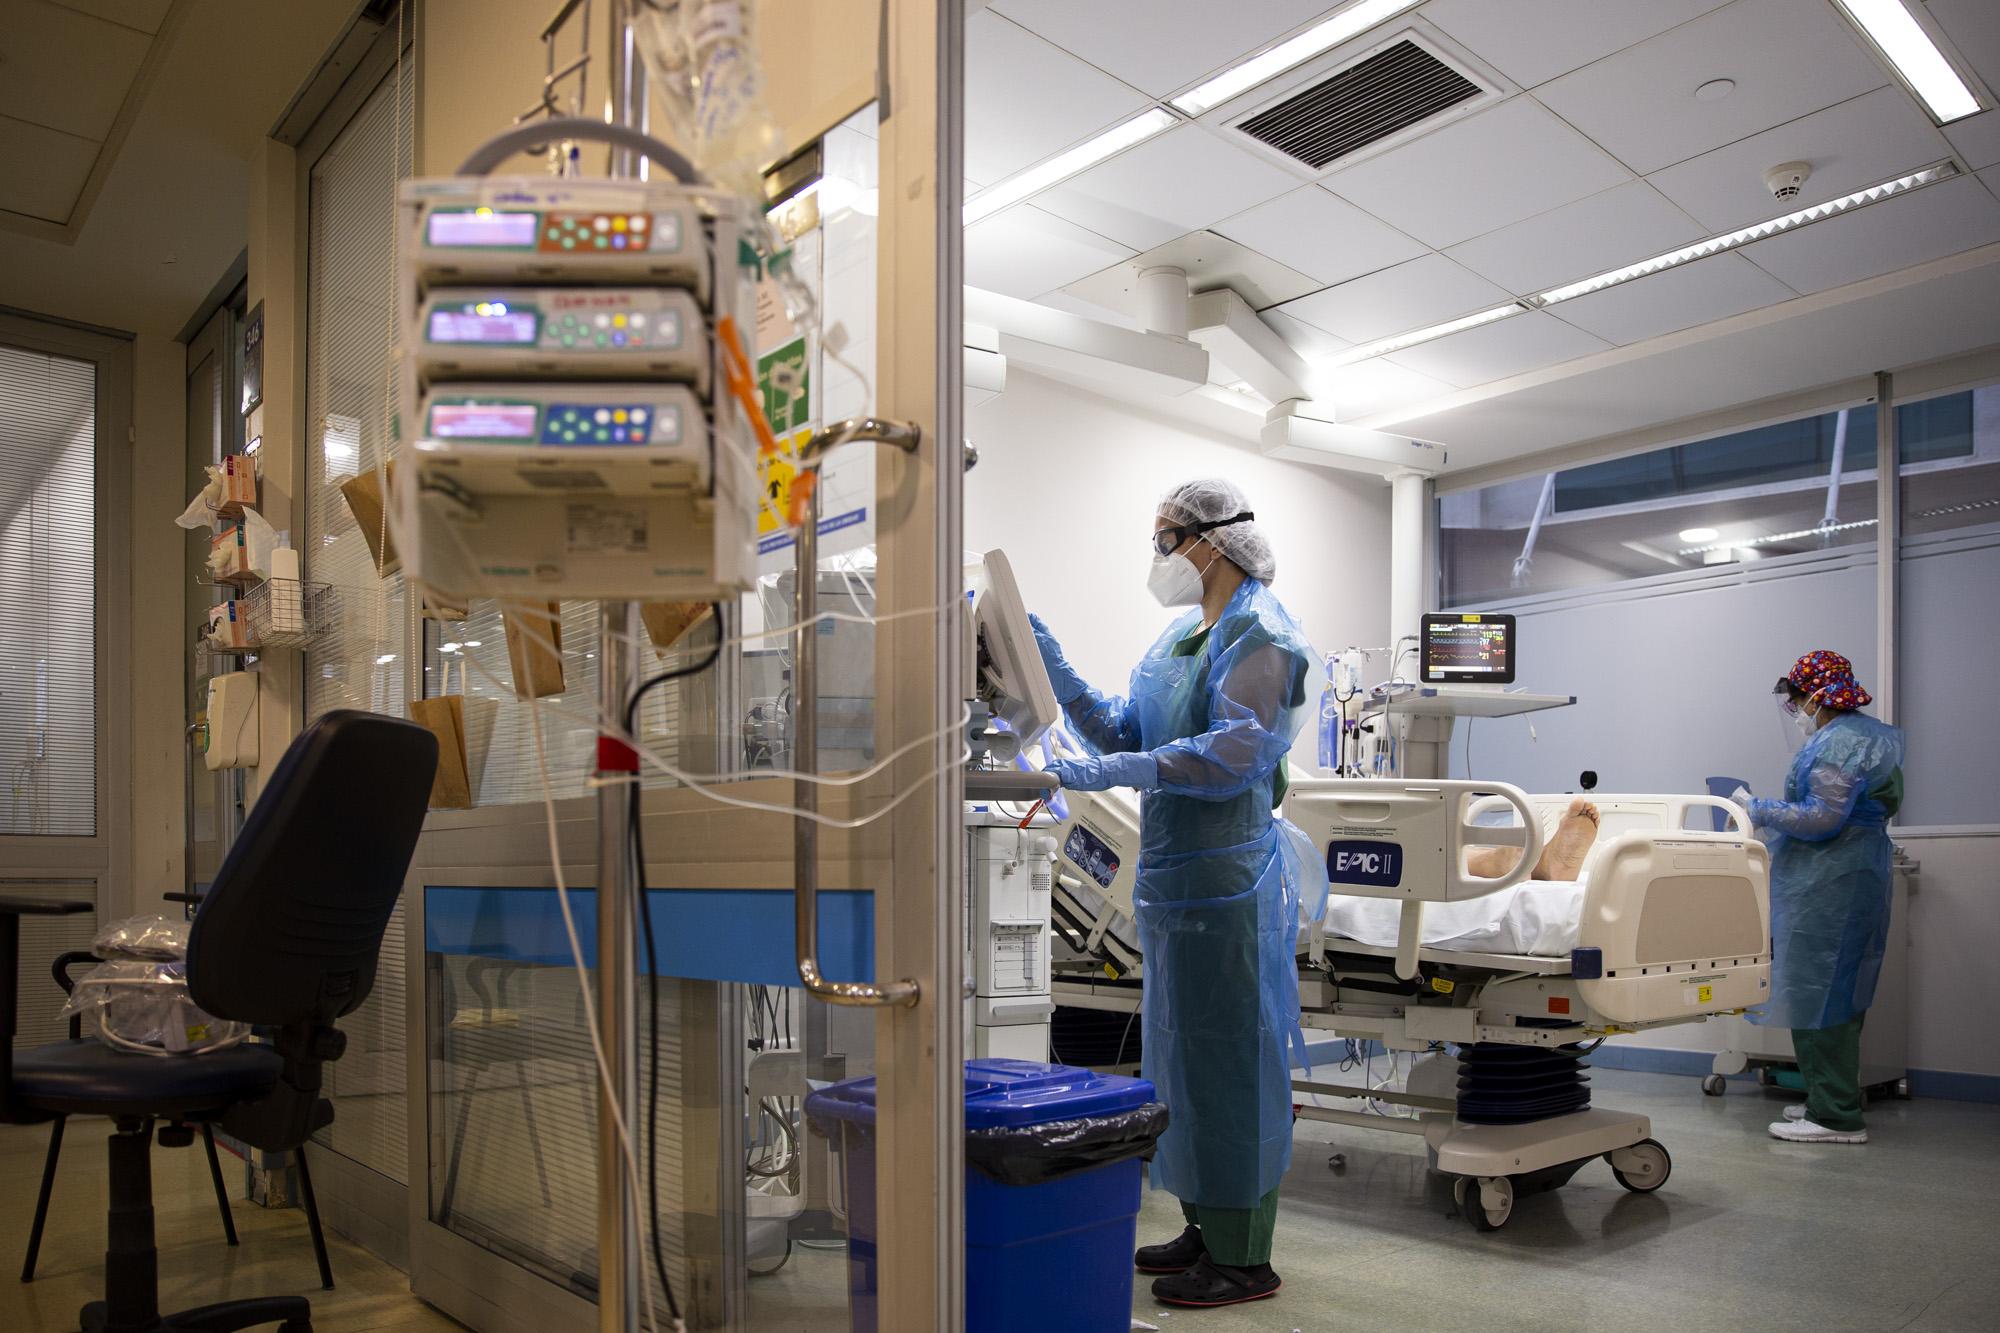 paciente_covid-19_huc-christus-karinafuenzalida-uc-wikipedia.jpg